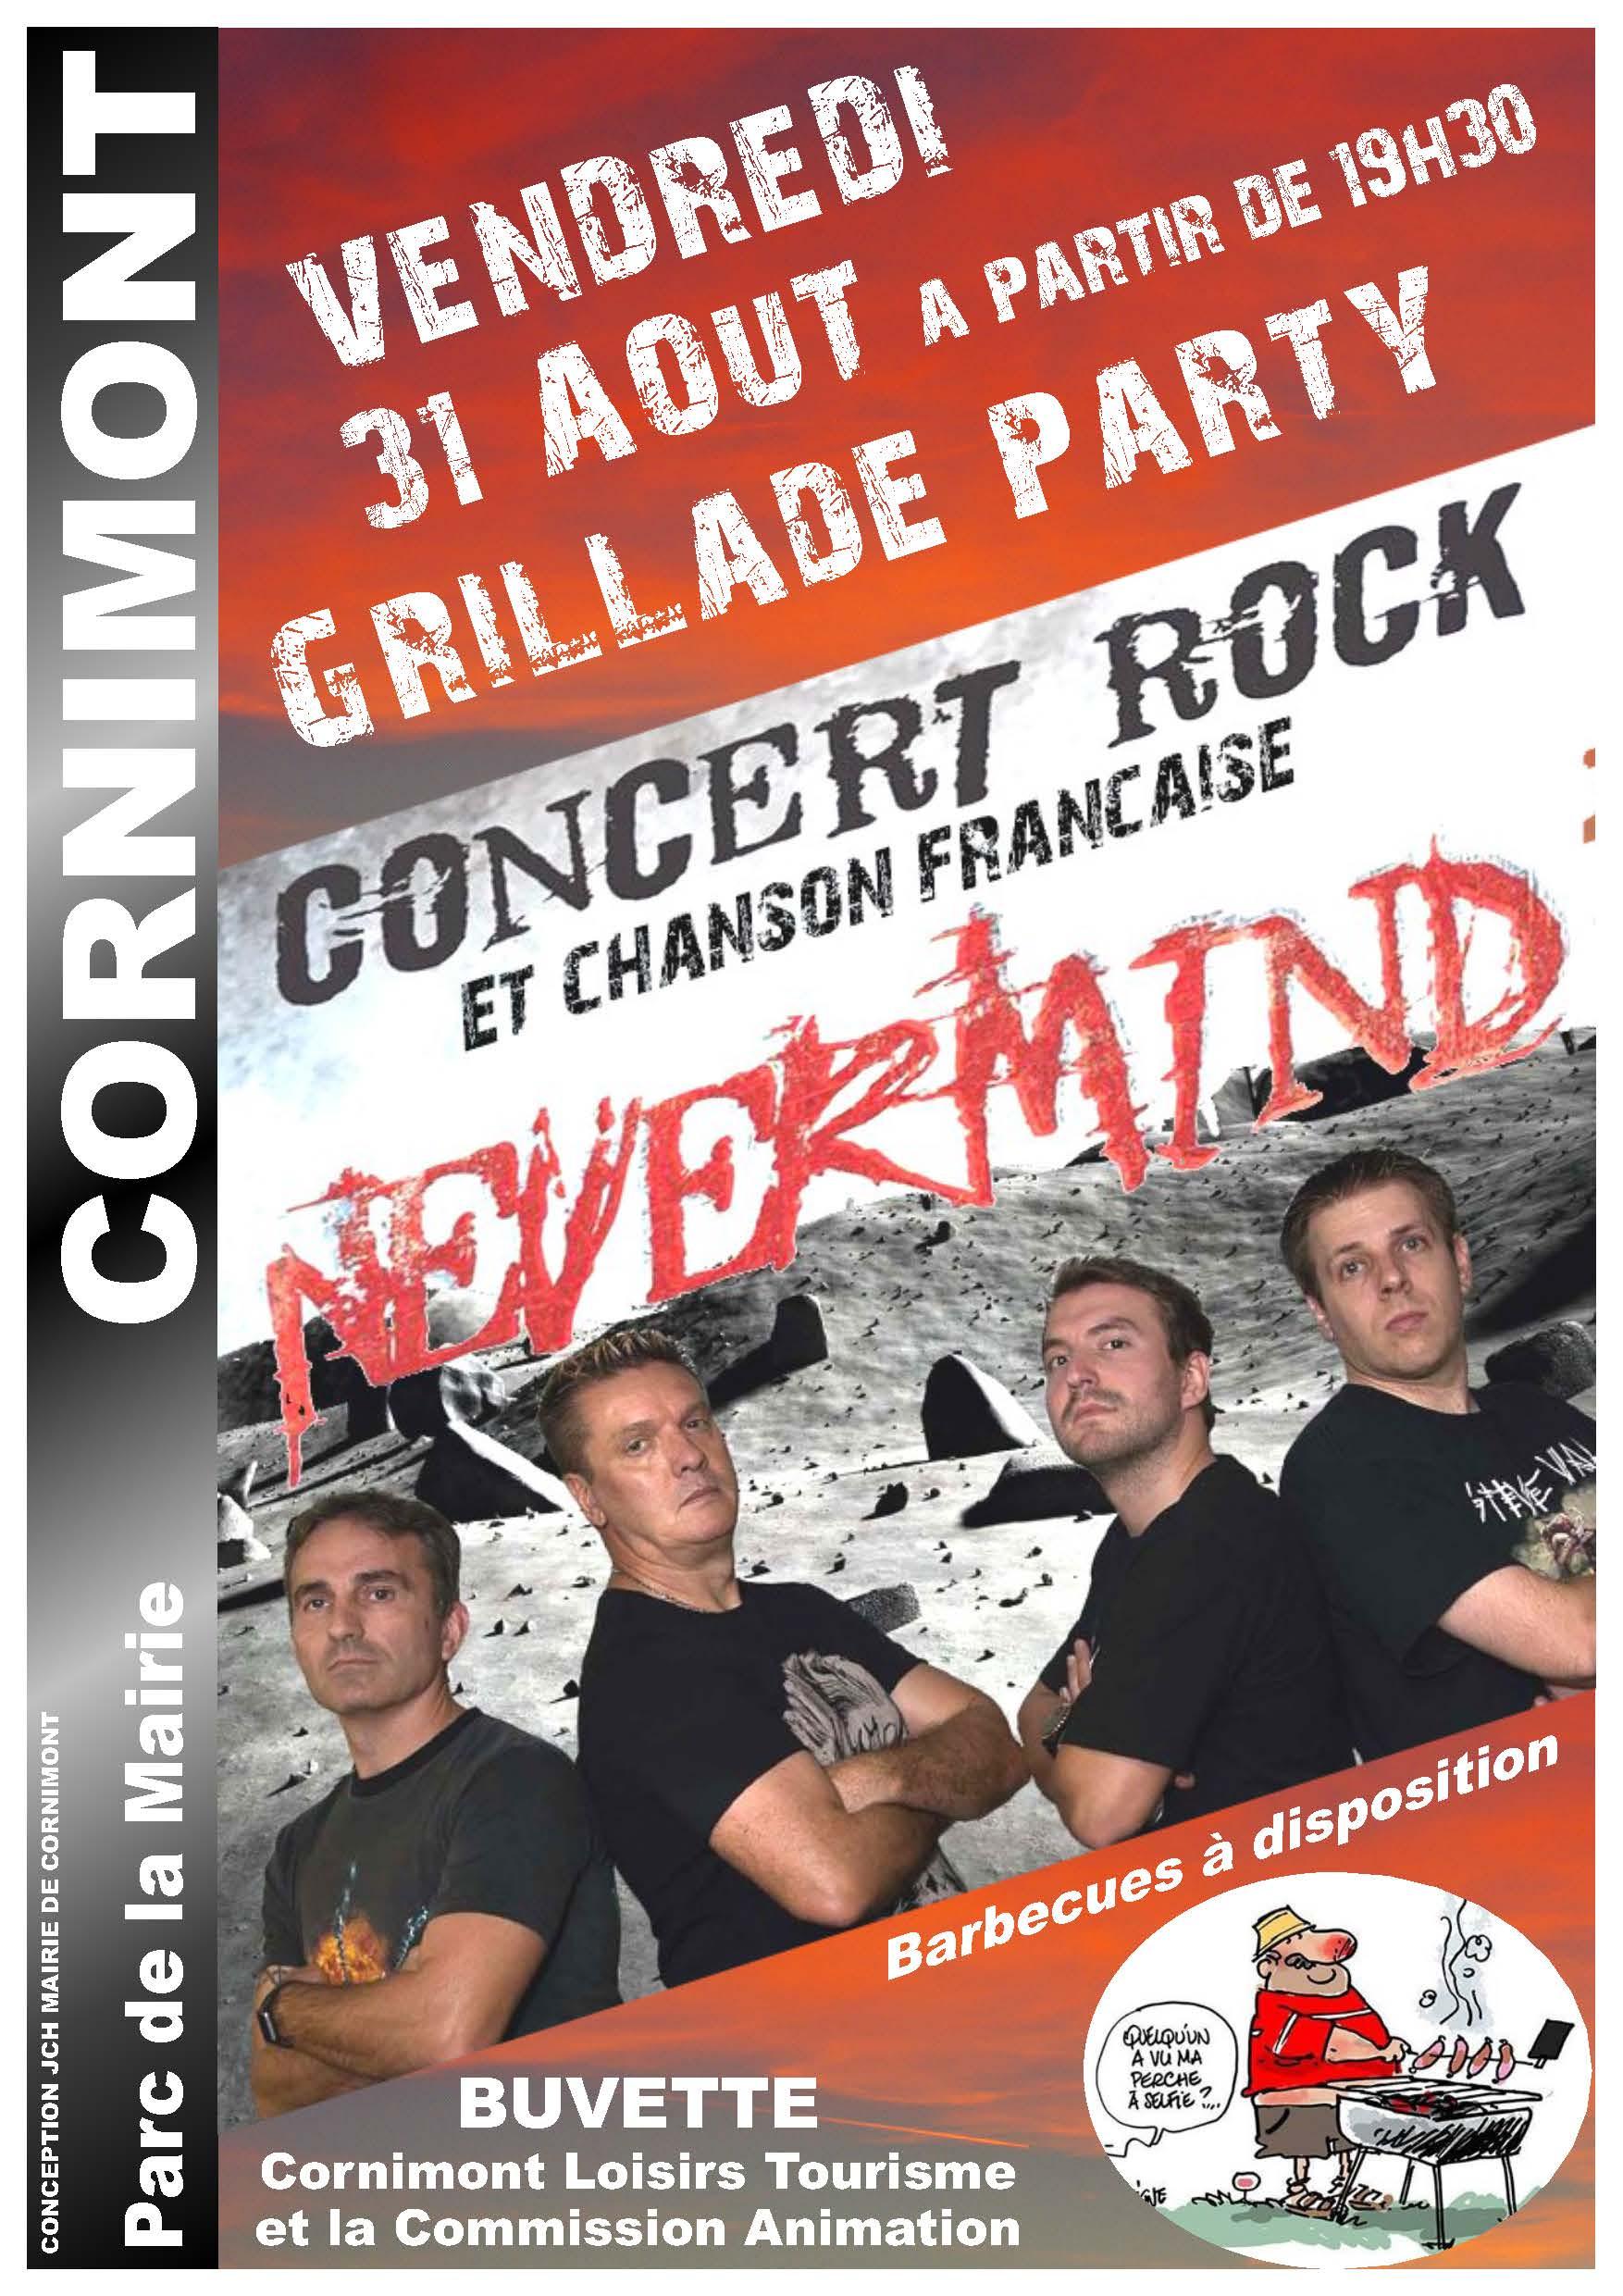 VENDREDI 31 AOUT Grillade Party Nevermind web